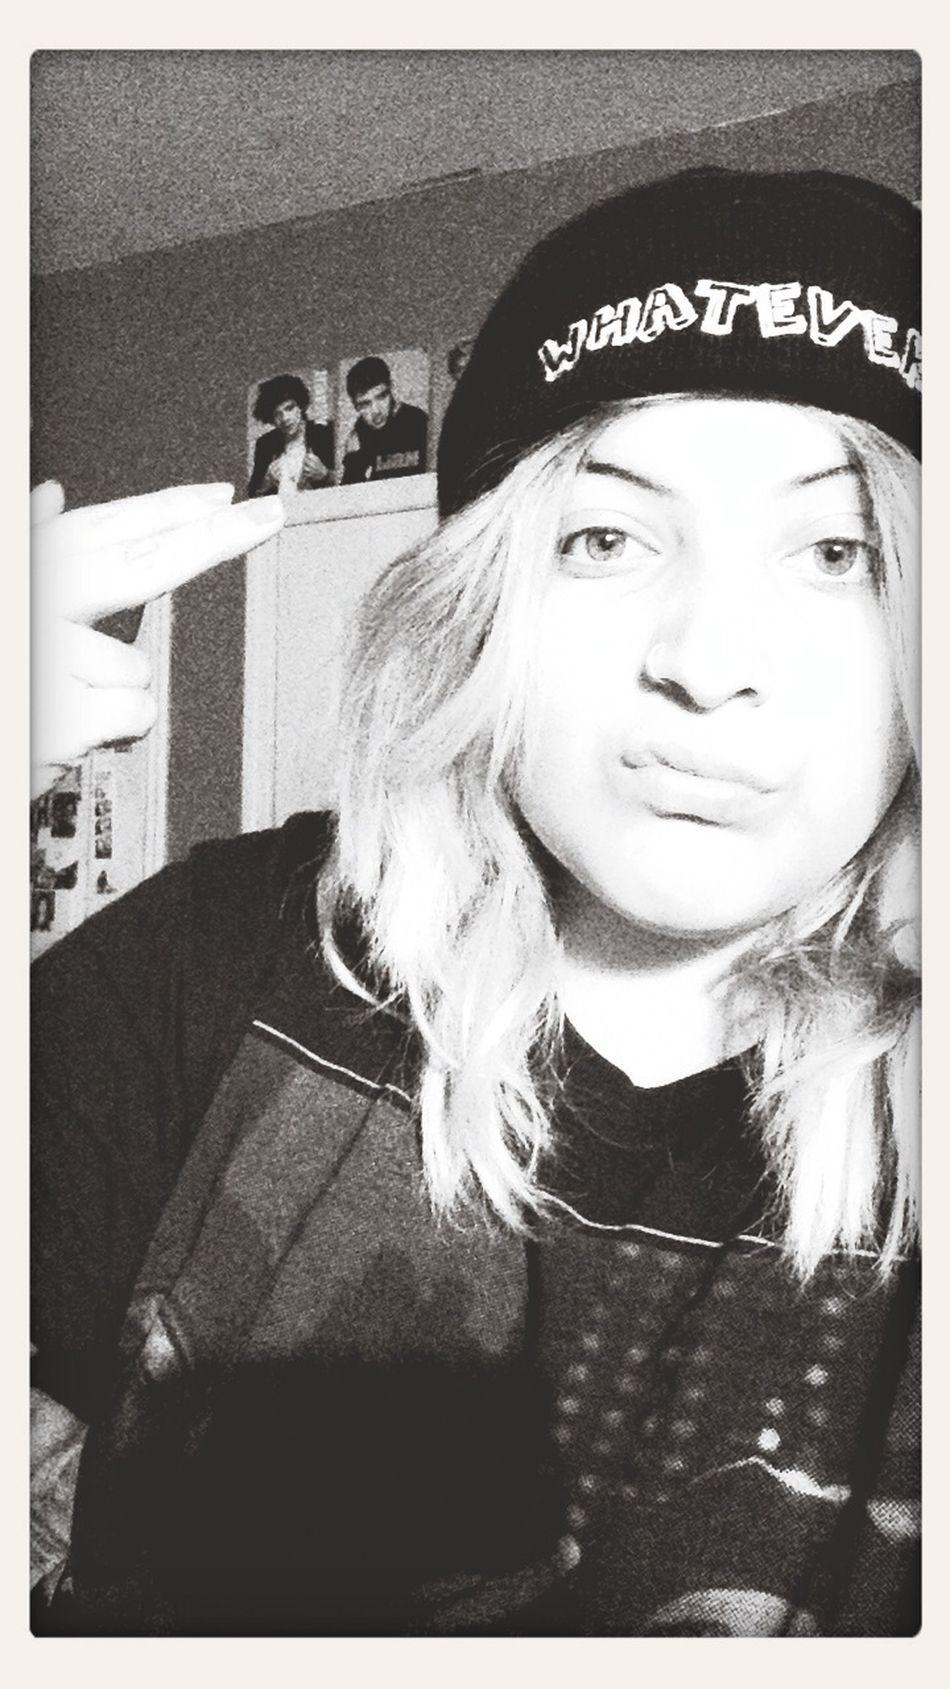 Night Whateverrr  Selfie